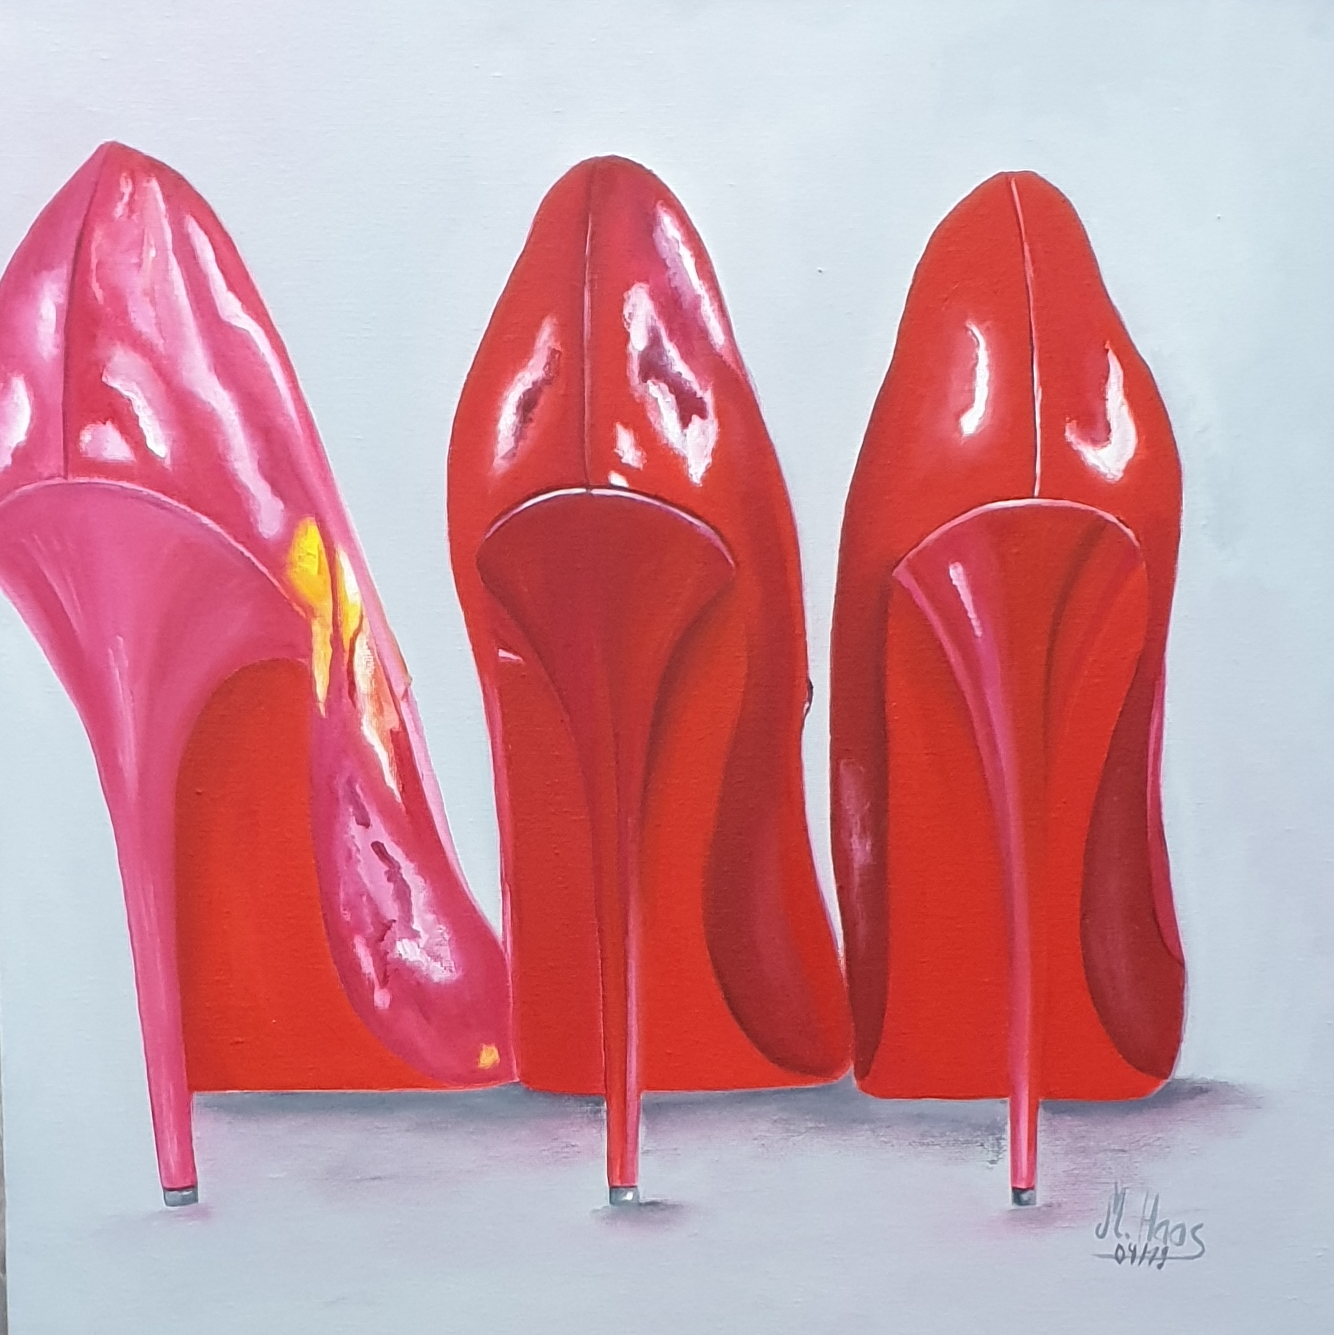 High-Heels-Oelmalerei-40x40cm-Marion-Haas-Pumps-pink-rot-